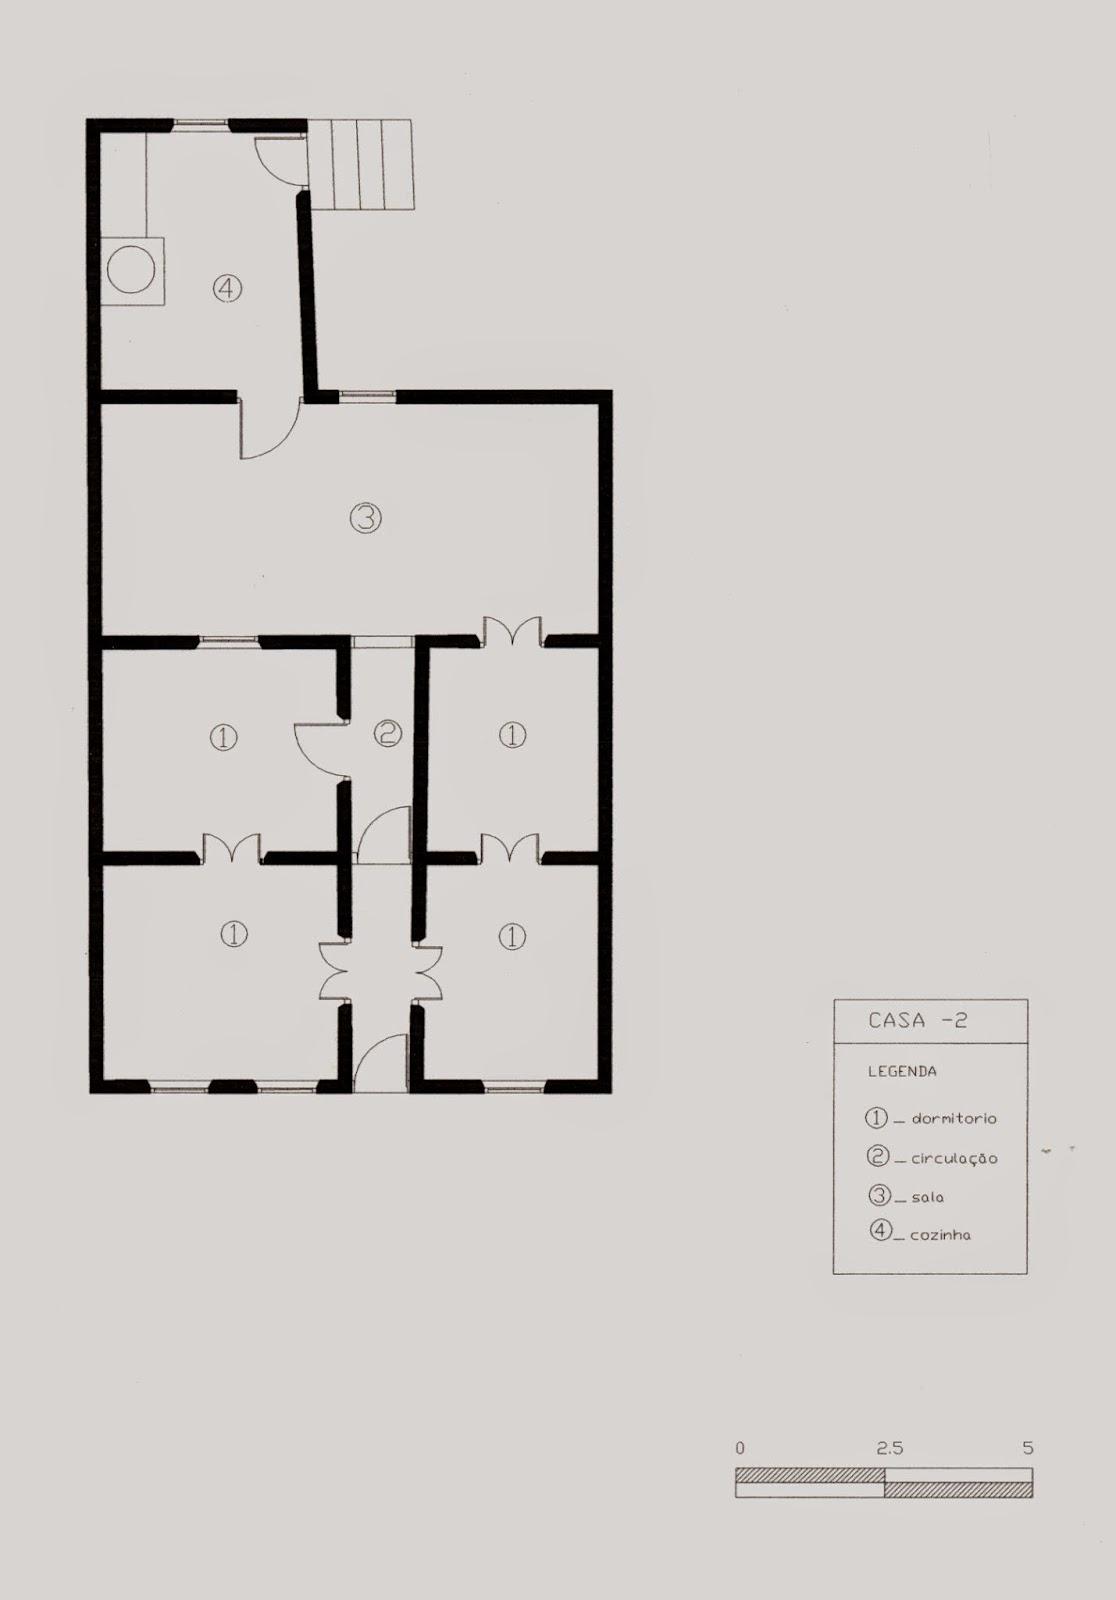 Amado casa abalcoada: arquitetura em Goiás II FT27